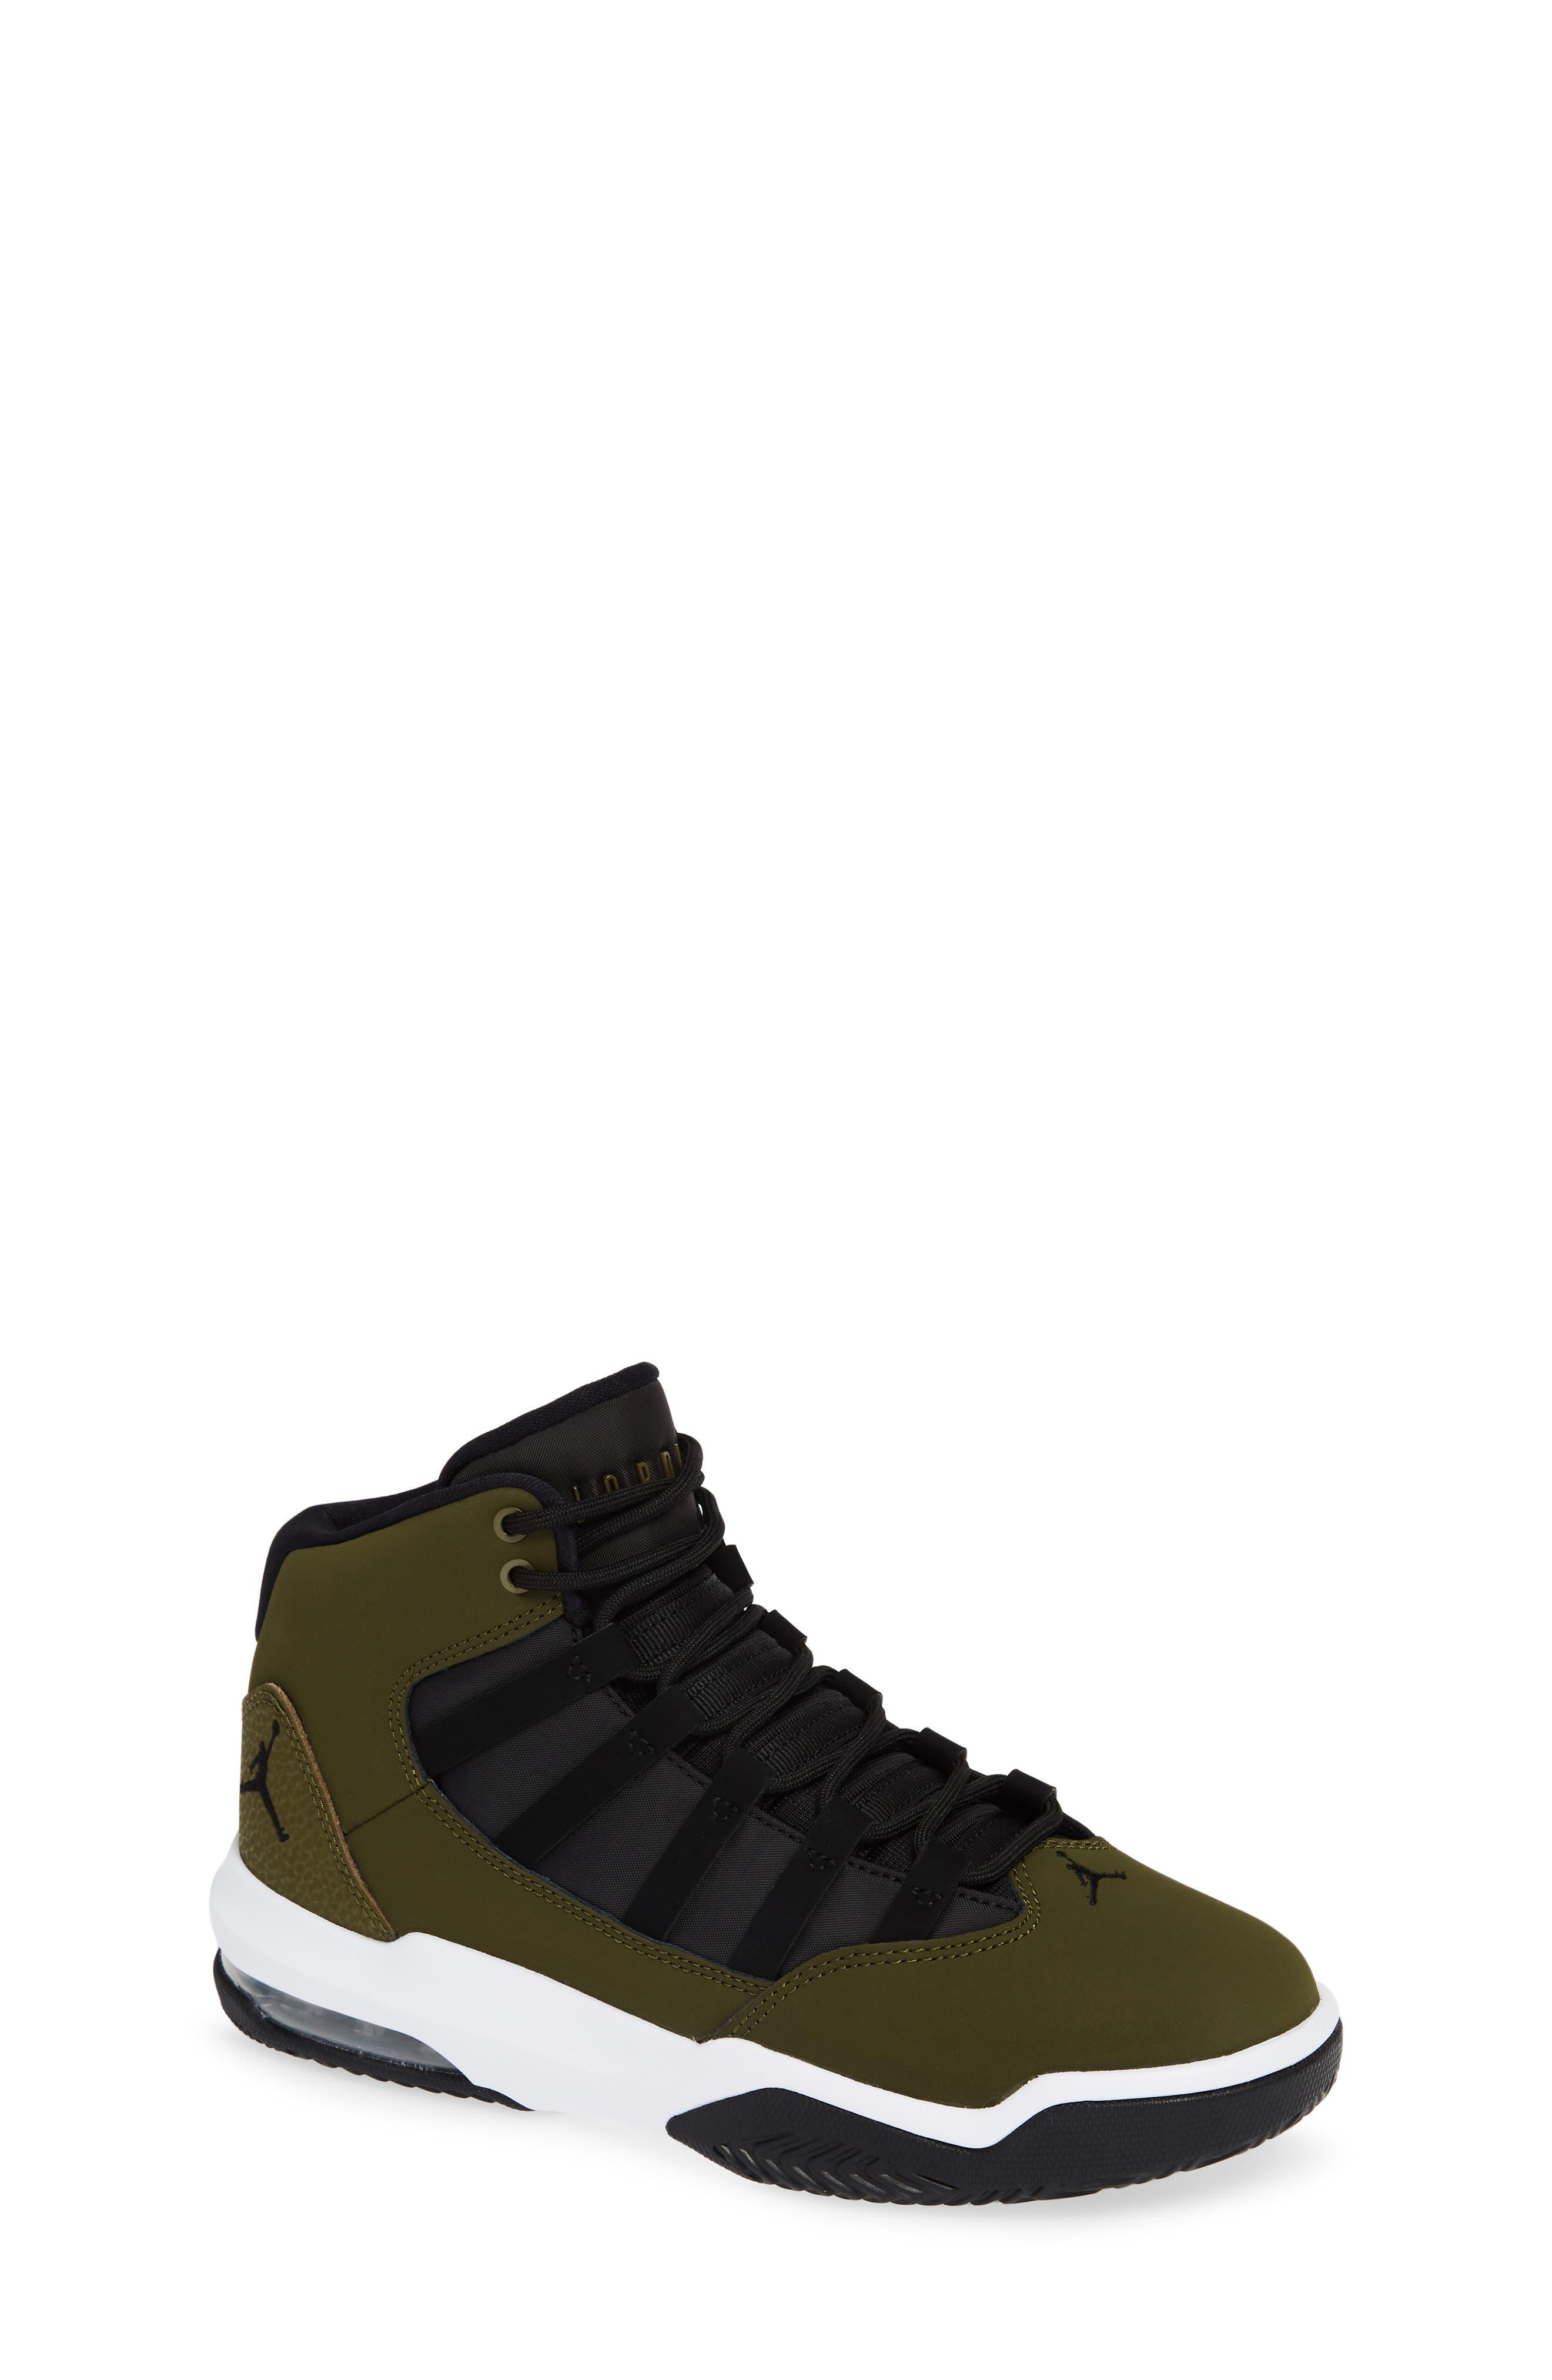 Jordan Max Aura Basketball Shoe,                             Main thumbnail 1, color,                             OLIVE CANVAS/ BLACK/ WHITE